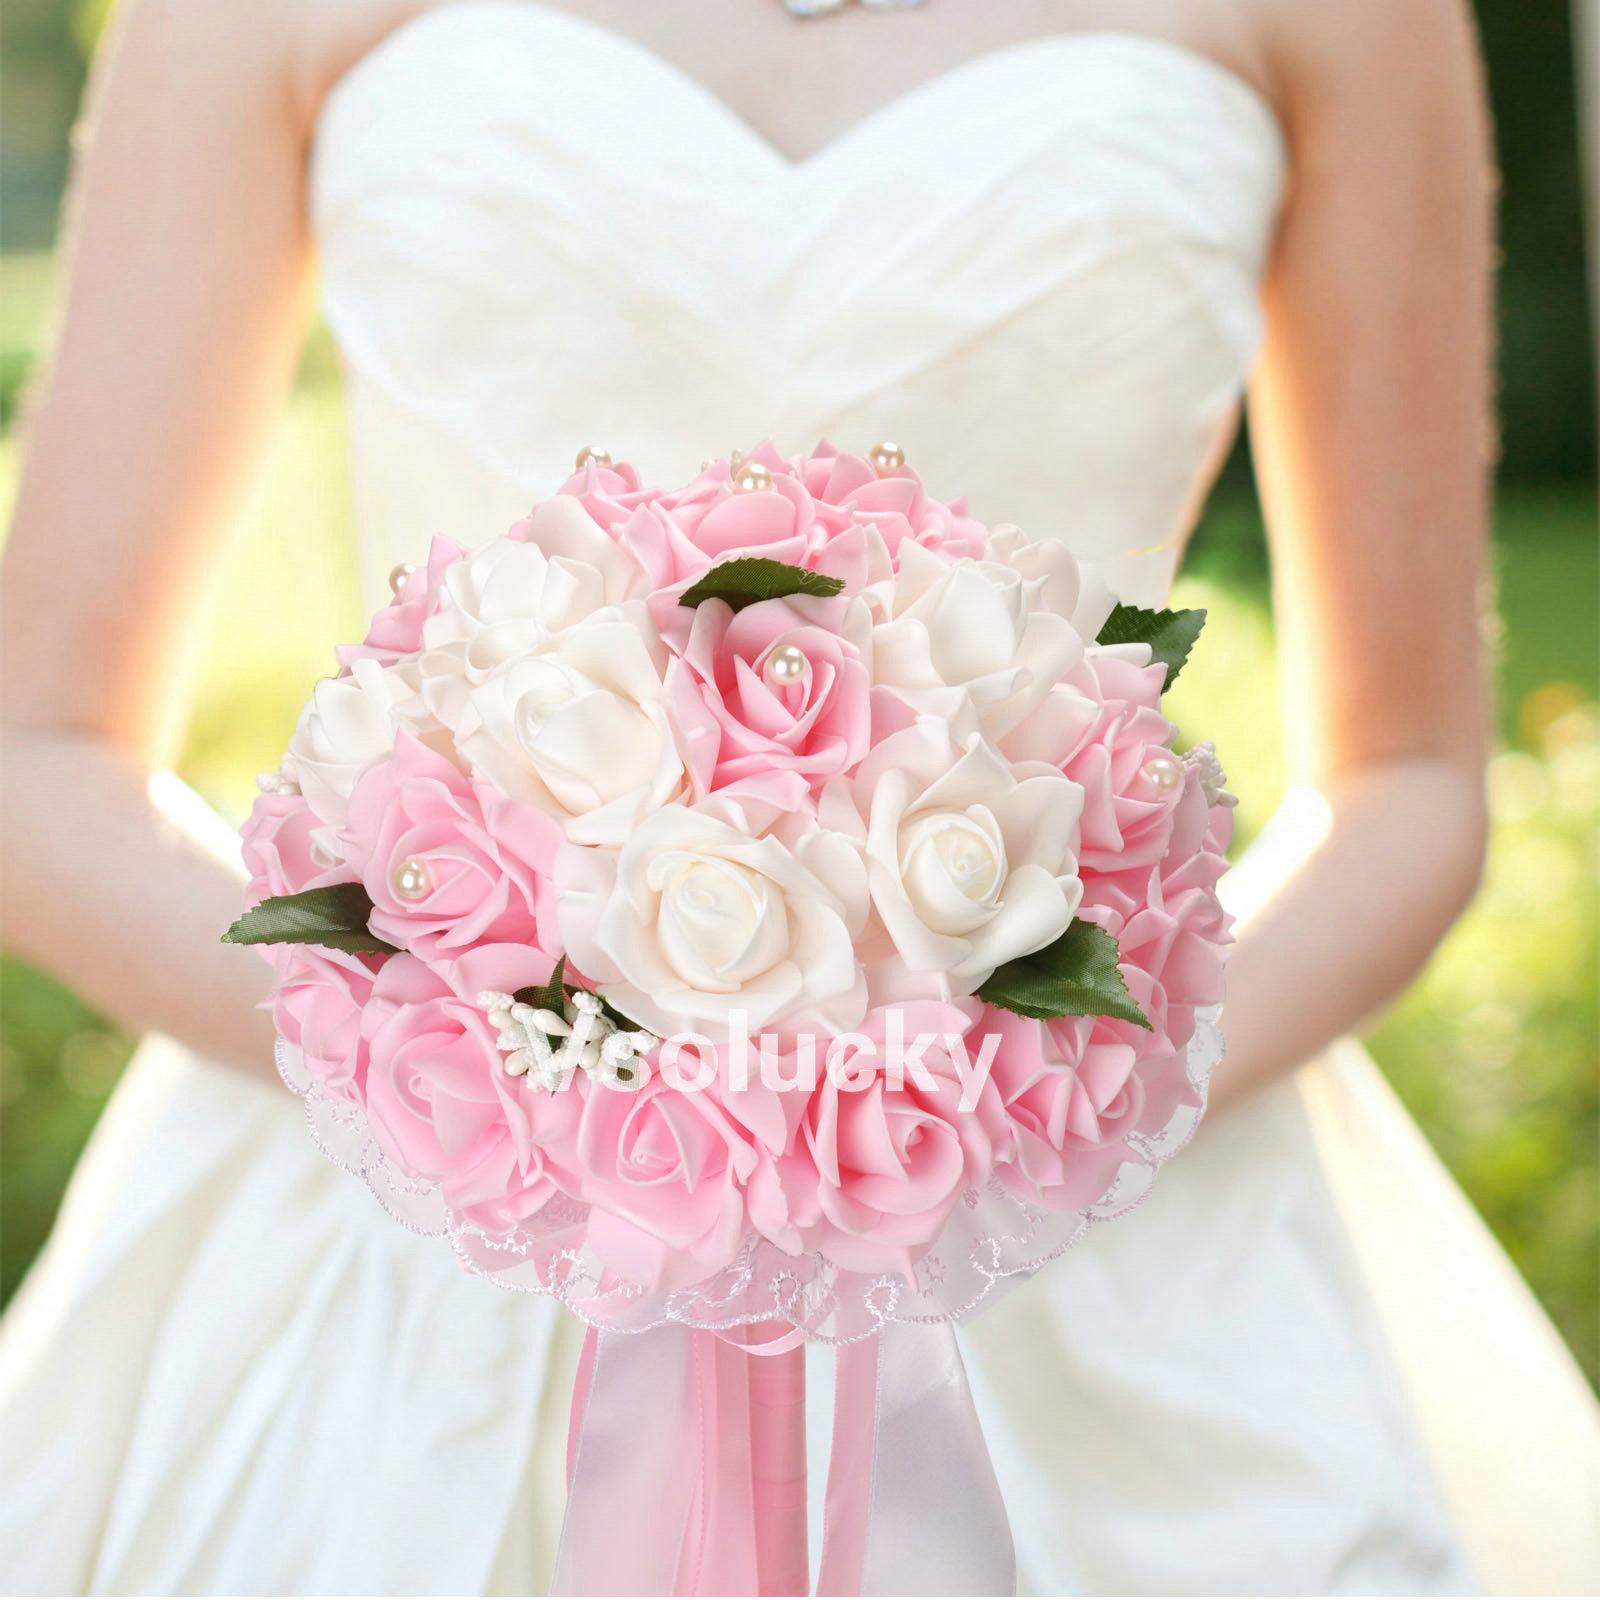 Wedding Bouquet Foam Flowers Rose Lace Bride Bridesmaid Girl Wand ...